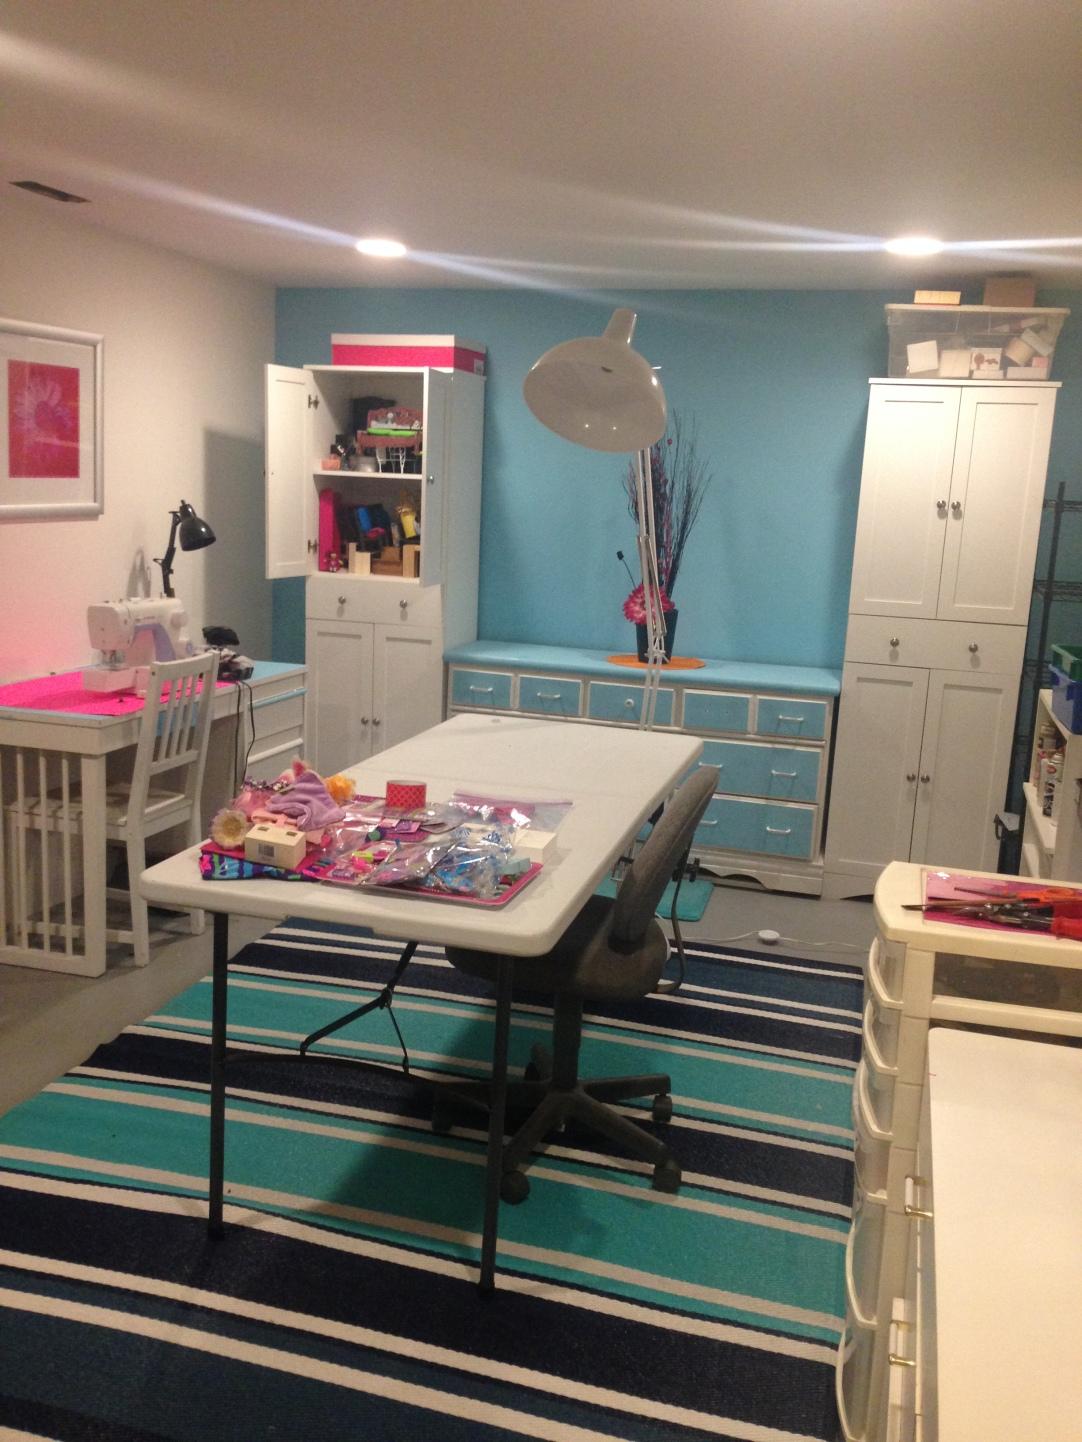 How To Organize A Craft Room #craft_storage #craftroom #craftroom_design #craftroom_organization #multi-purpose